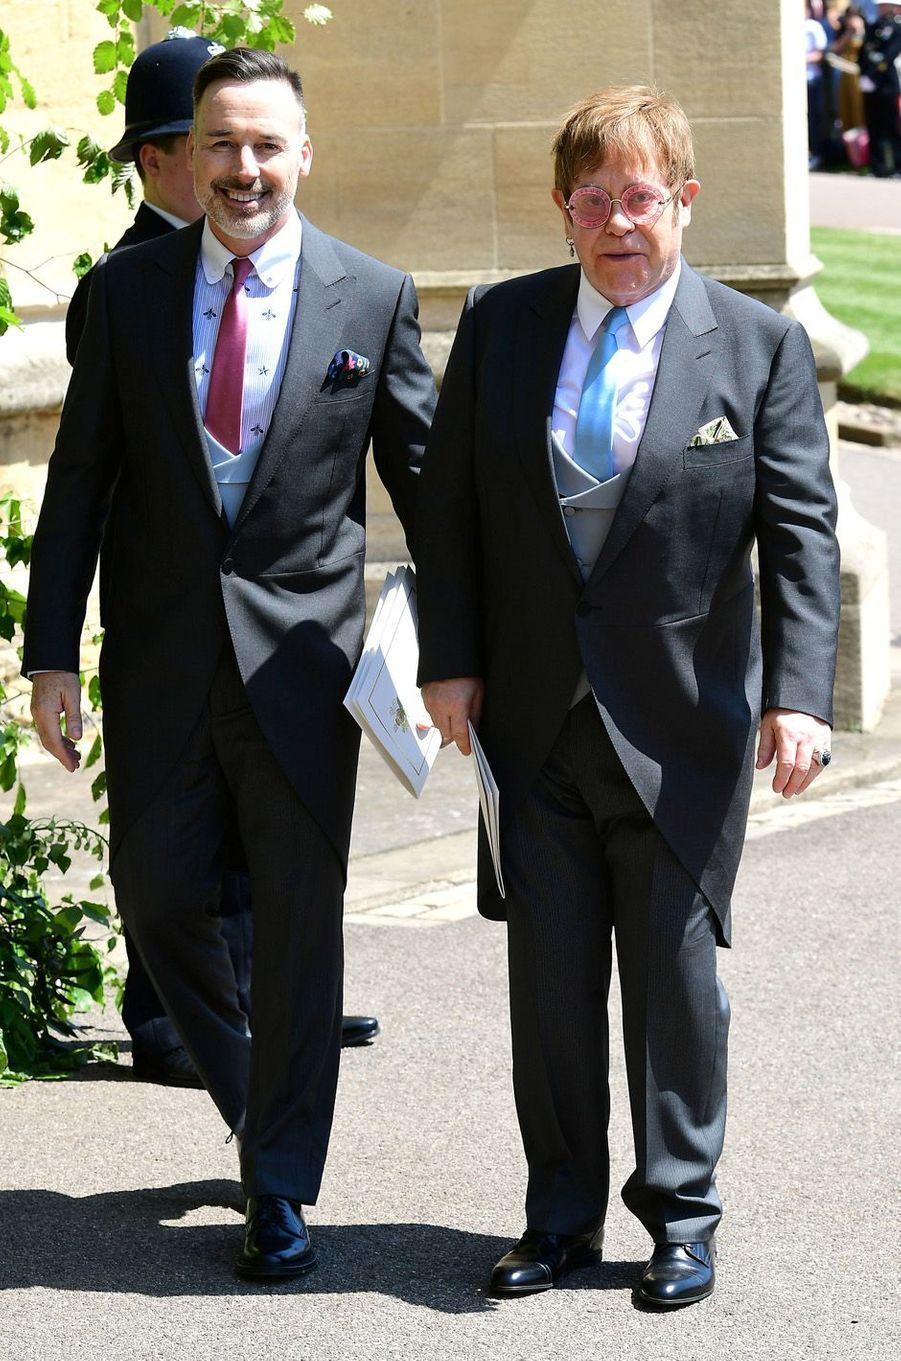 Elton John et son mari David Furnish au mariage de Meghan et Harry, le 19 mai 2018.